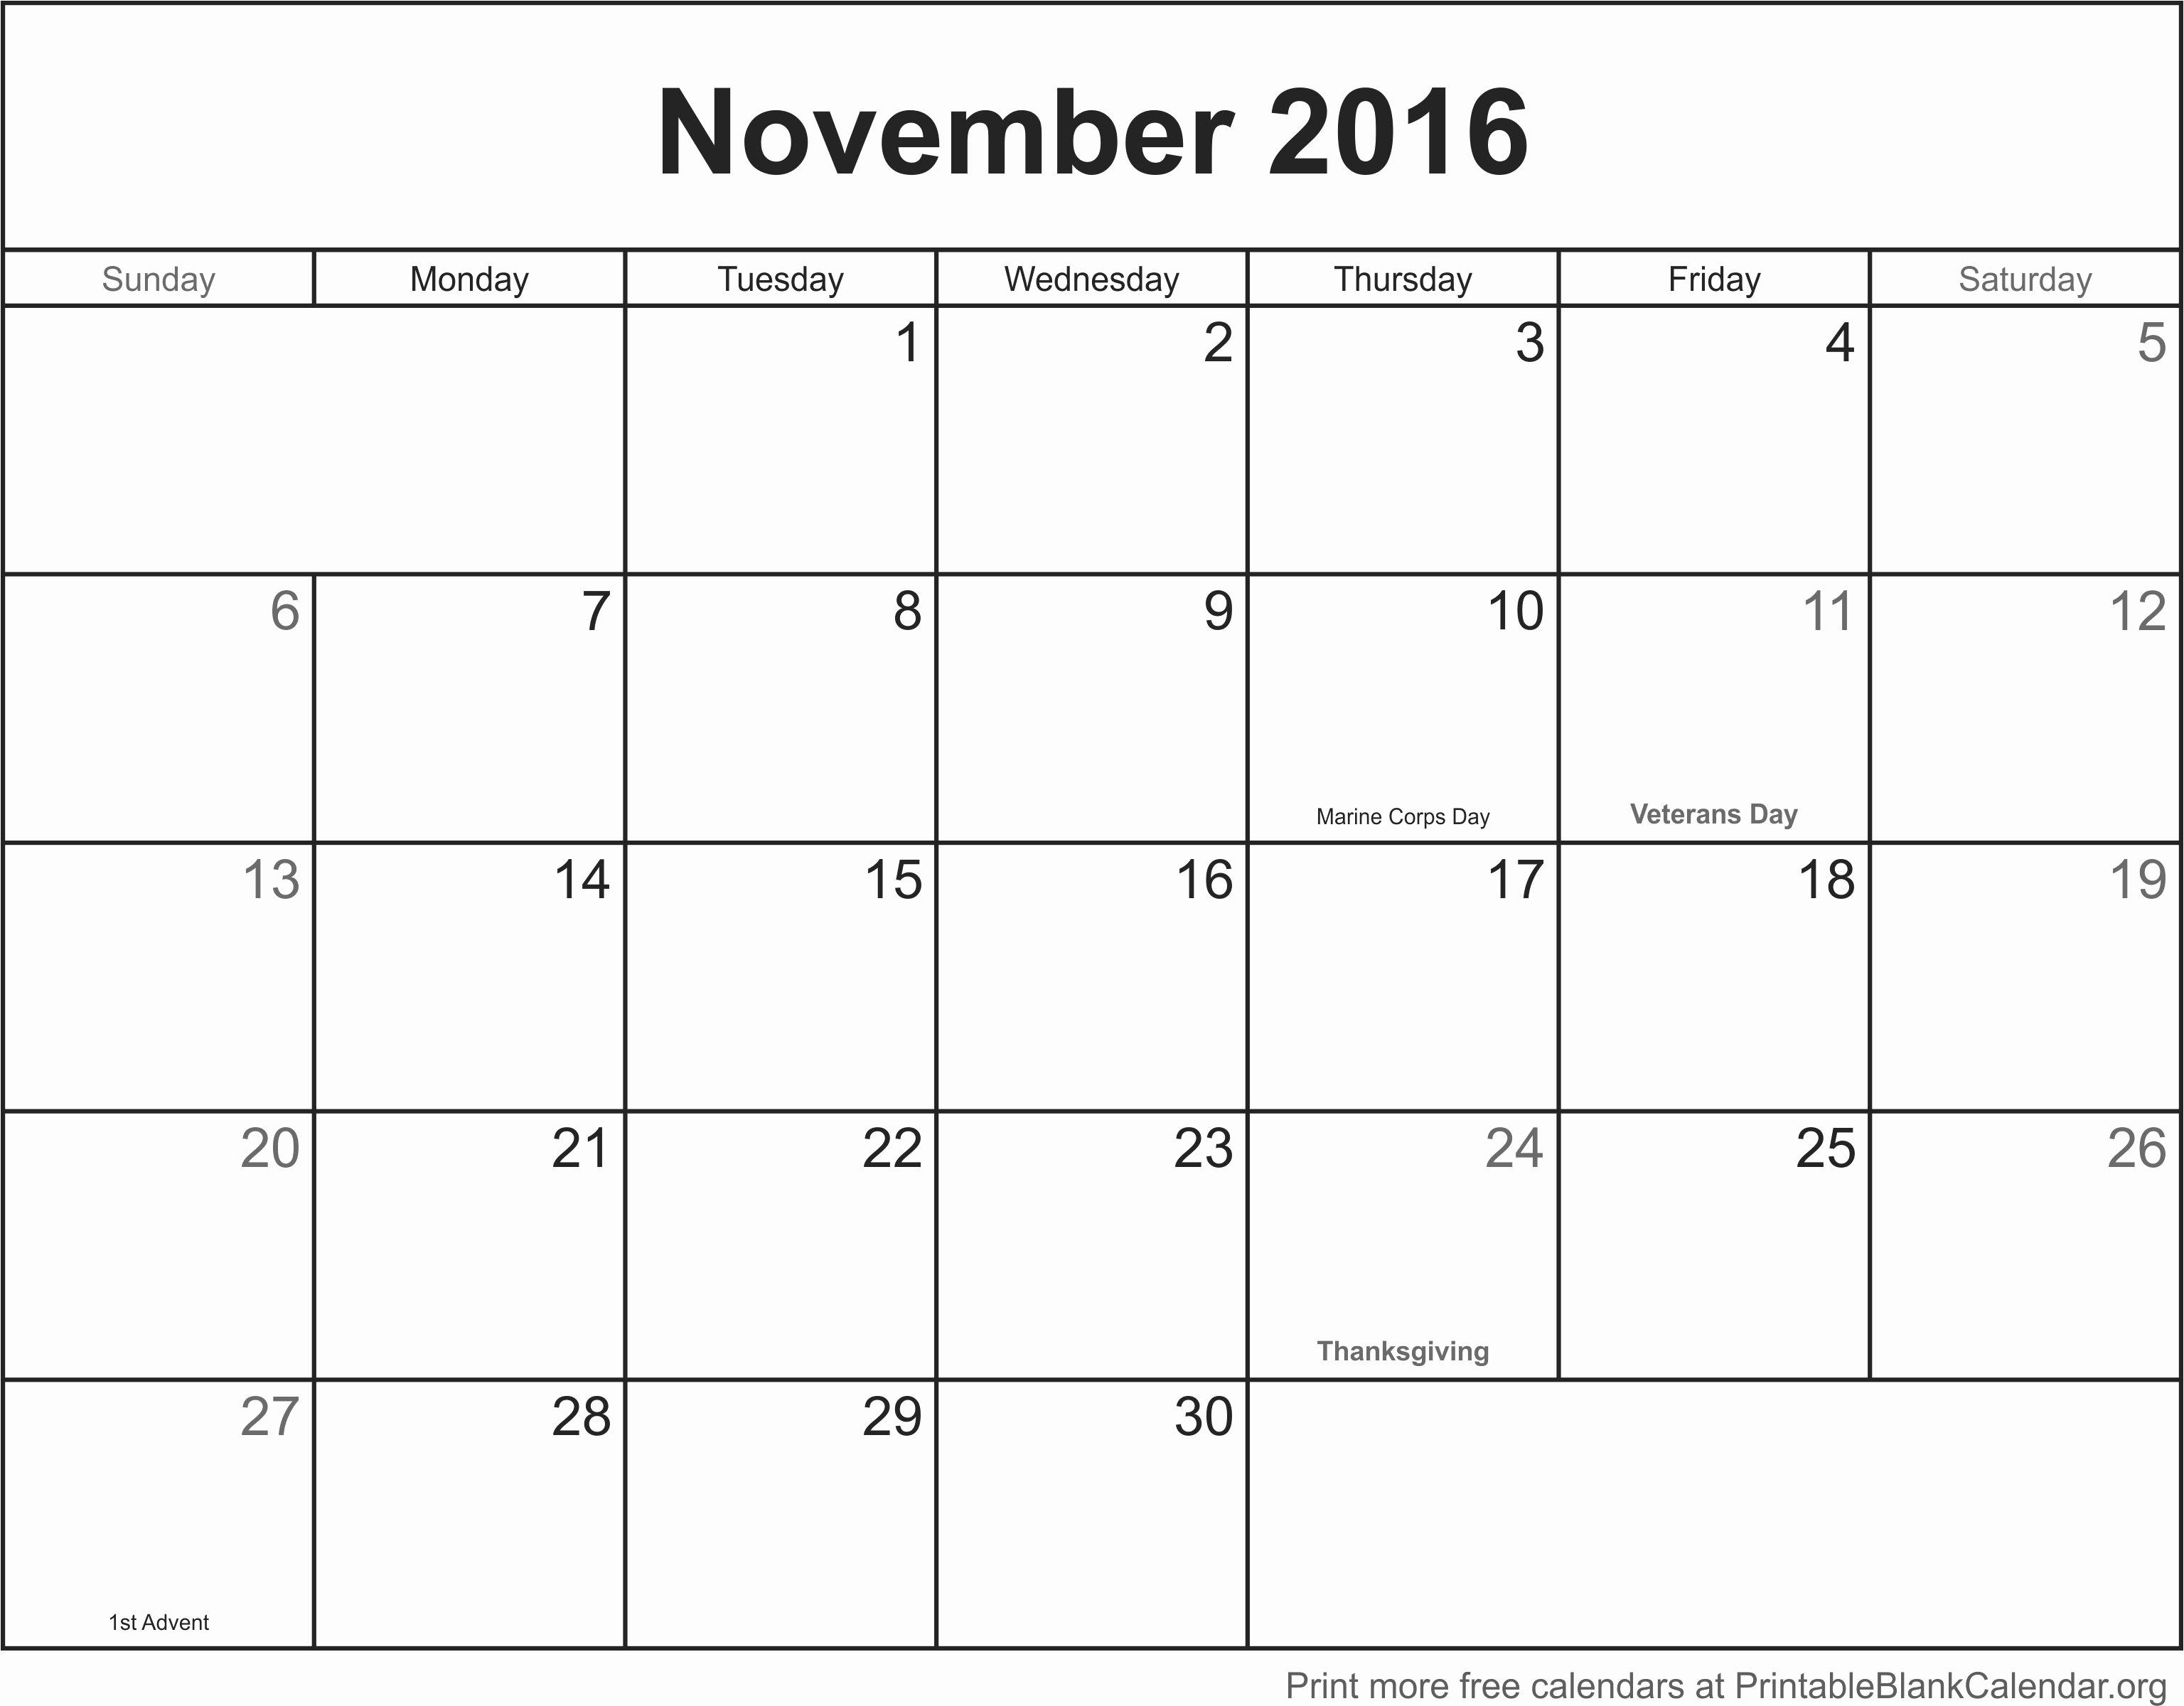 November 2016 Printable Blank Calendar Printable Blank